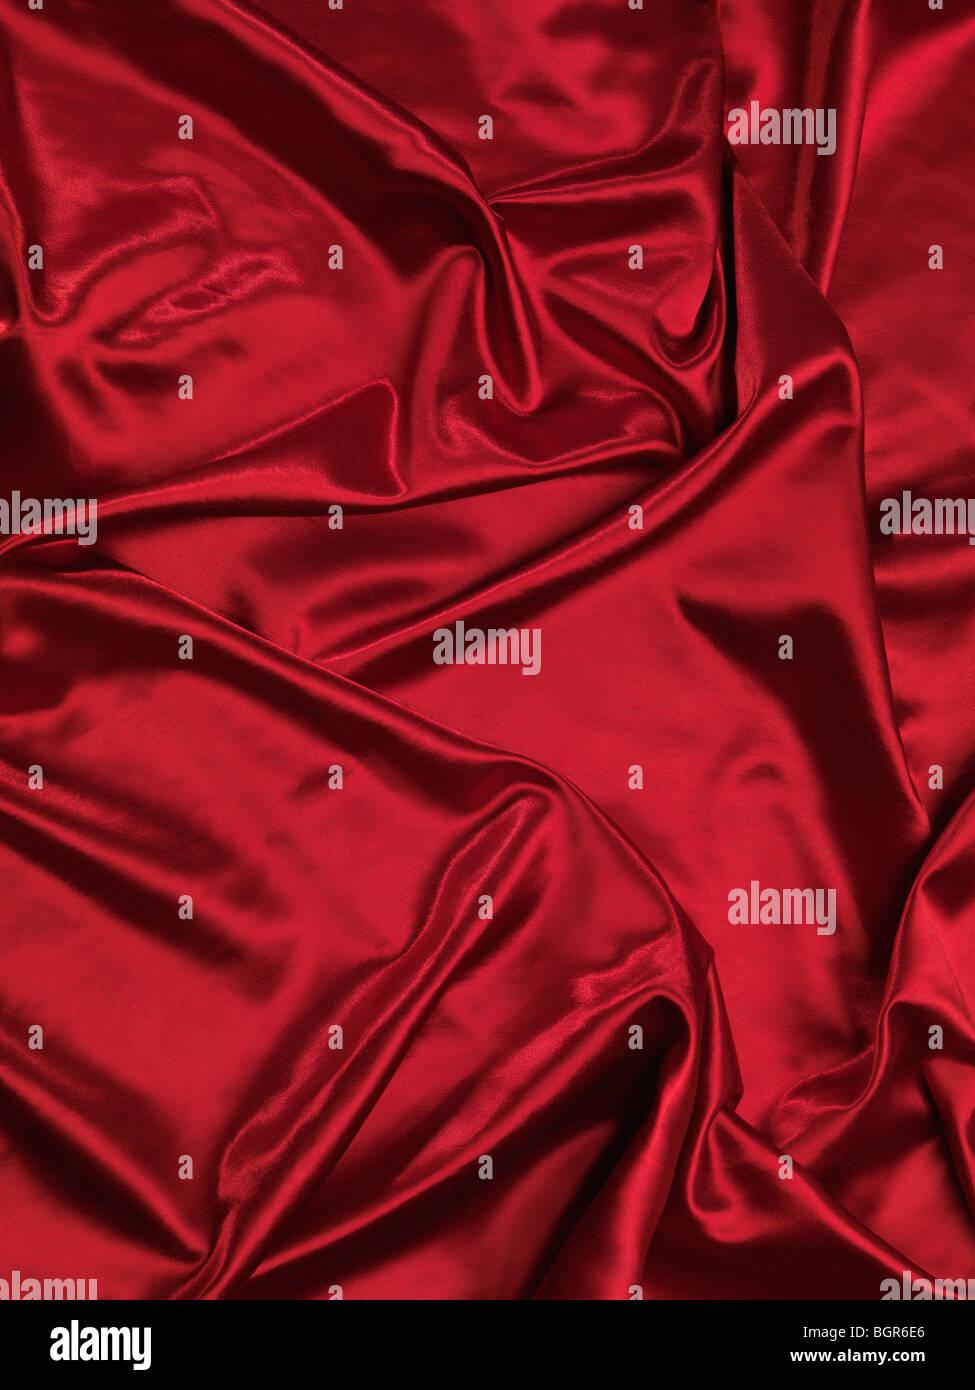 Fond tissu soyeux rouge brillant Photo Stock